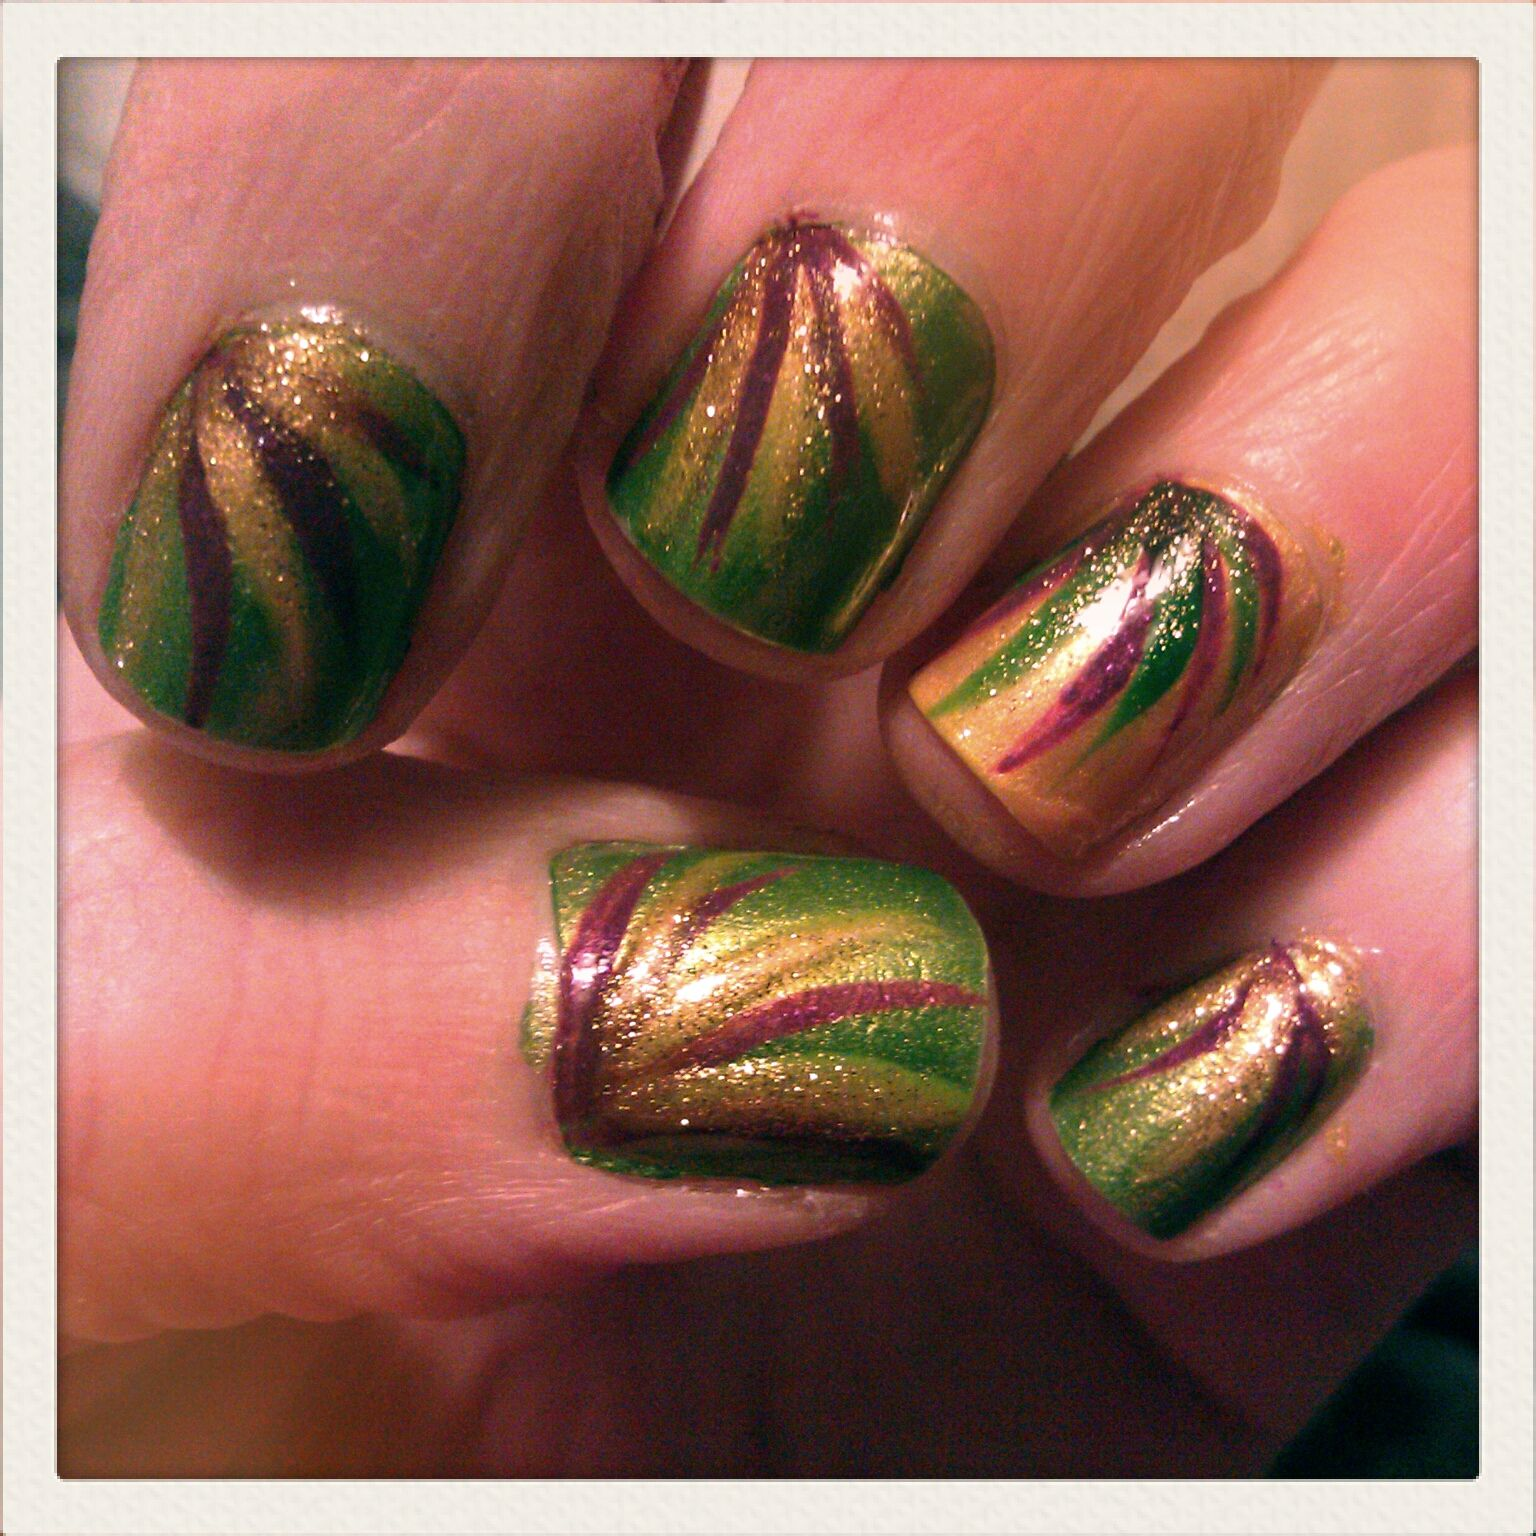 Mardi Gras nails :] Love nail art! check out www.MyNailPolishObsession.com - Mardi Gras Nails :] Love Nail Art! Check Out Www